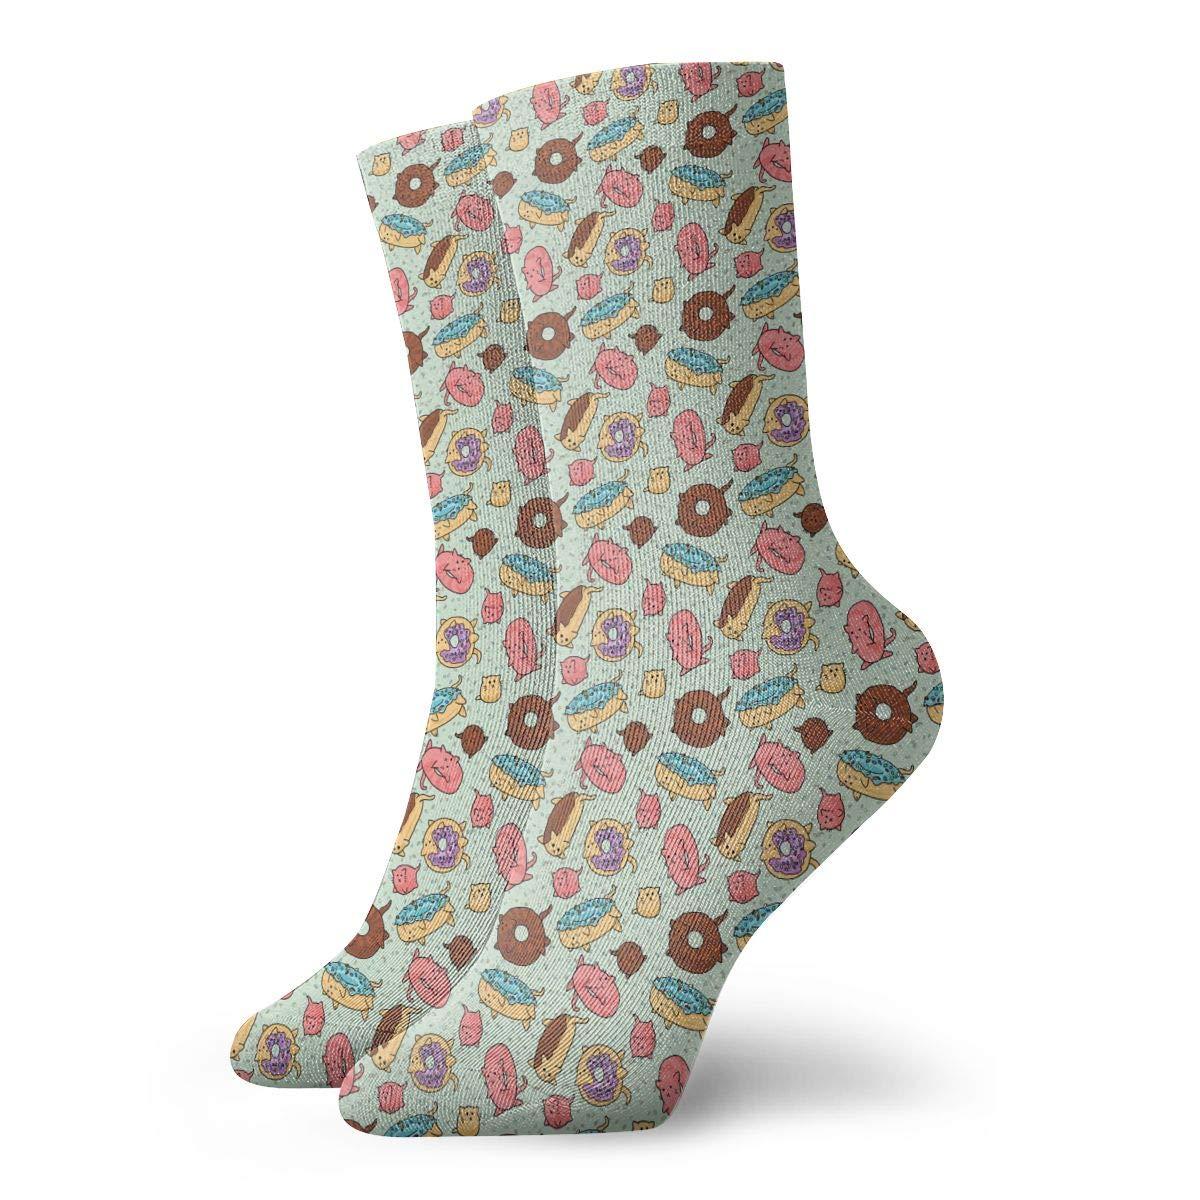 Doughnut Unisex Funny Casual Crew Socks Athletic Socks For Boys Girls Kids Teenagers